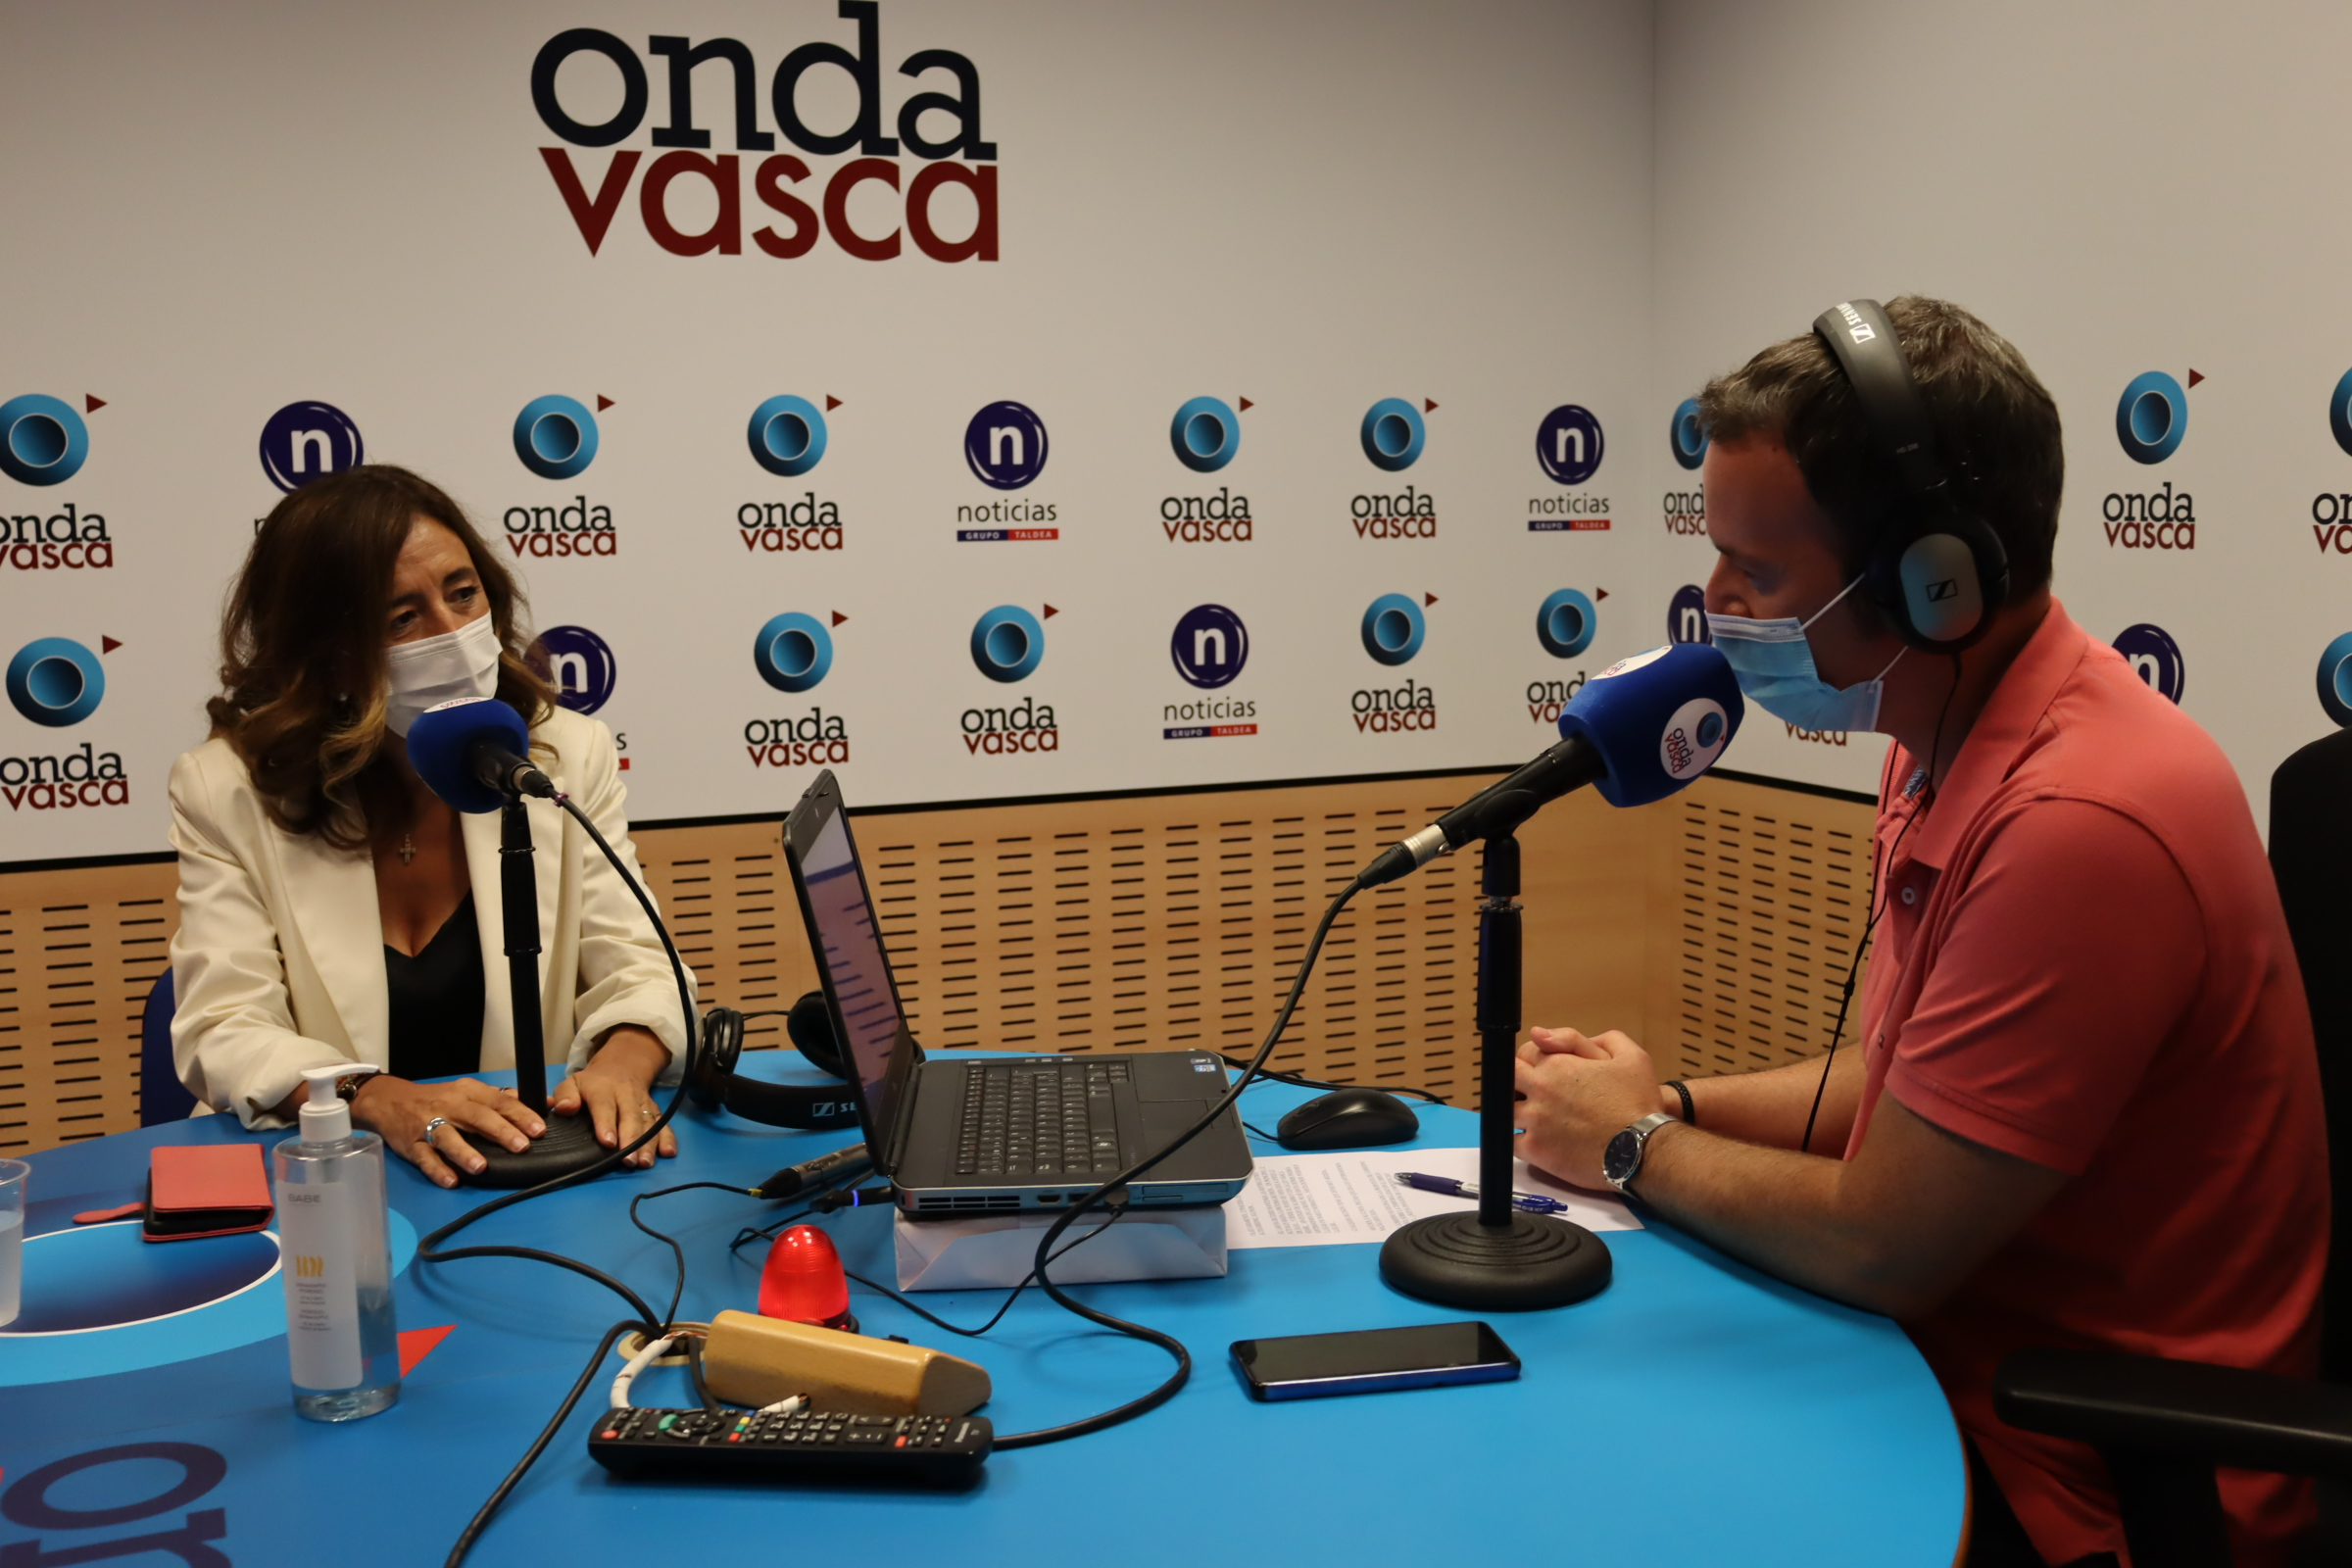 Onda_Vasca_2021-7-8._3.JPG